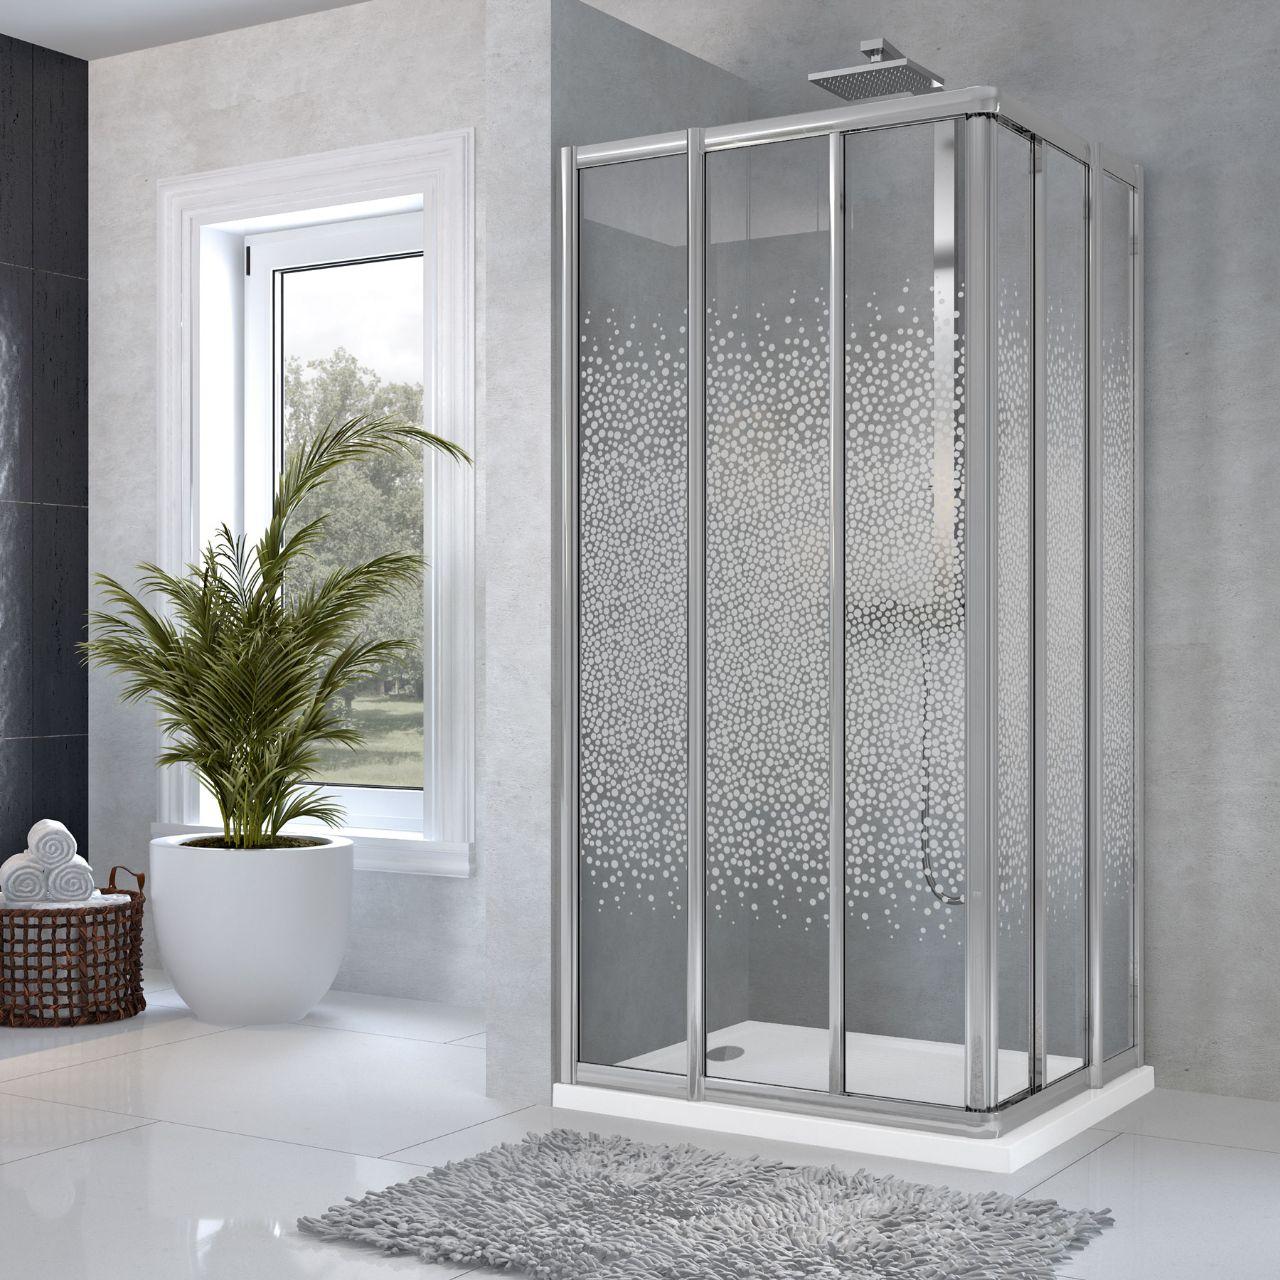 parois de douche new star 3a novellini. Black Bedroom Furniture Sets. Home Design Ideas